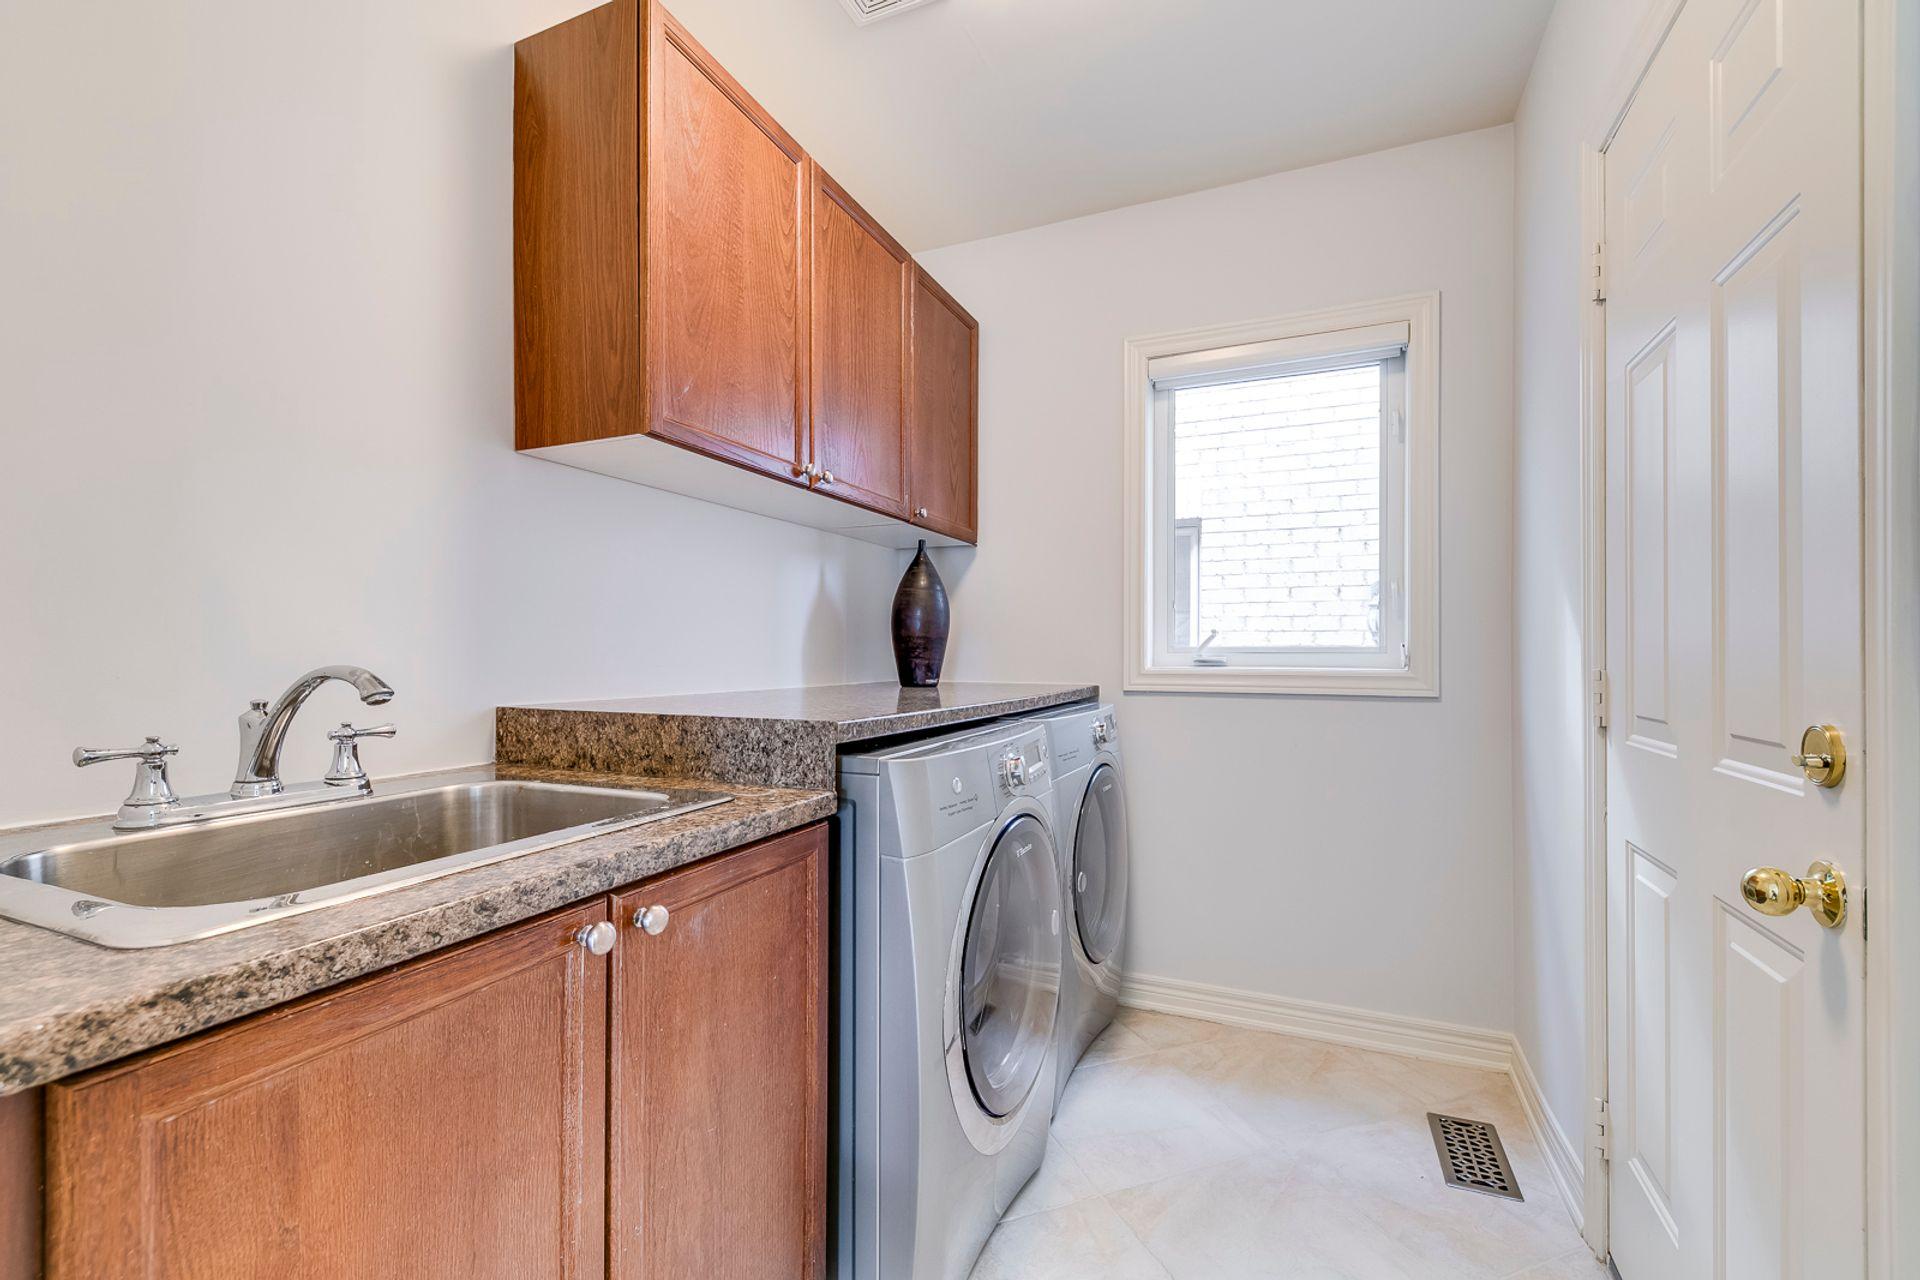 Laundry Room - 2487 Bon Echo Dr, Oakville - Elite3 & Team at 2487 Bon Echo Drive, Iroquois Ridge North, Oakville